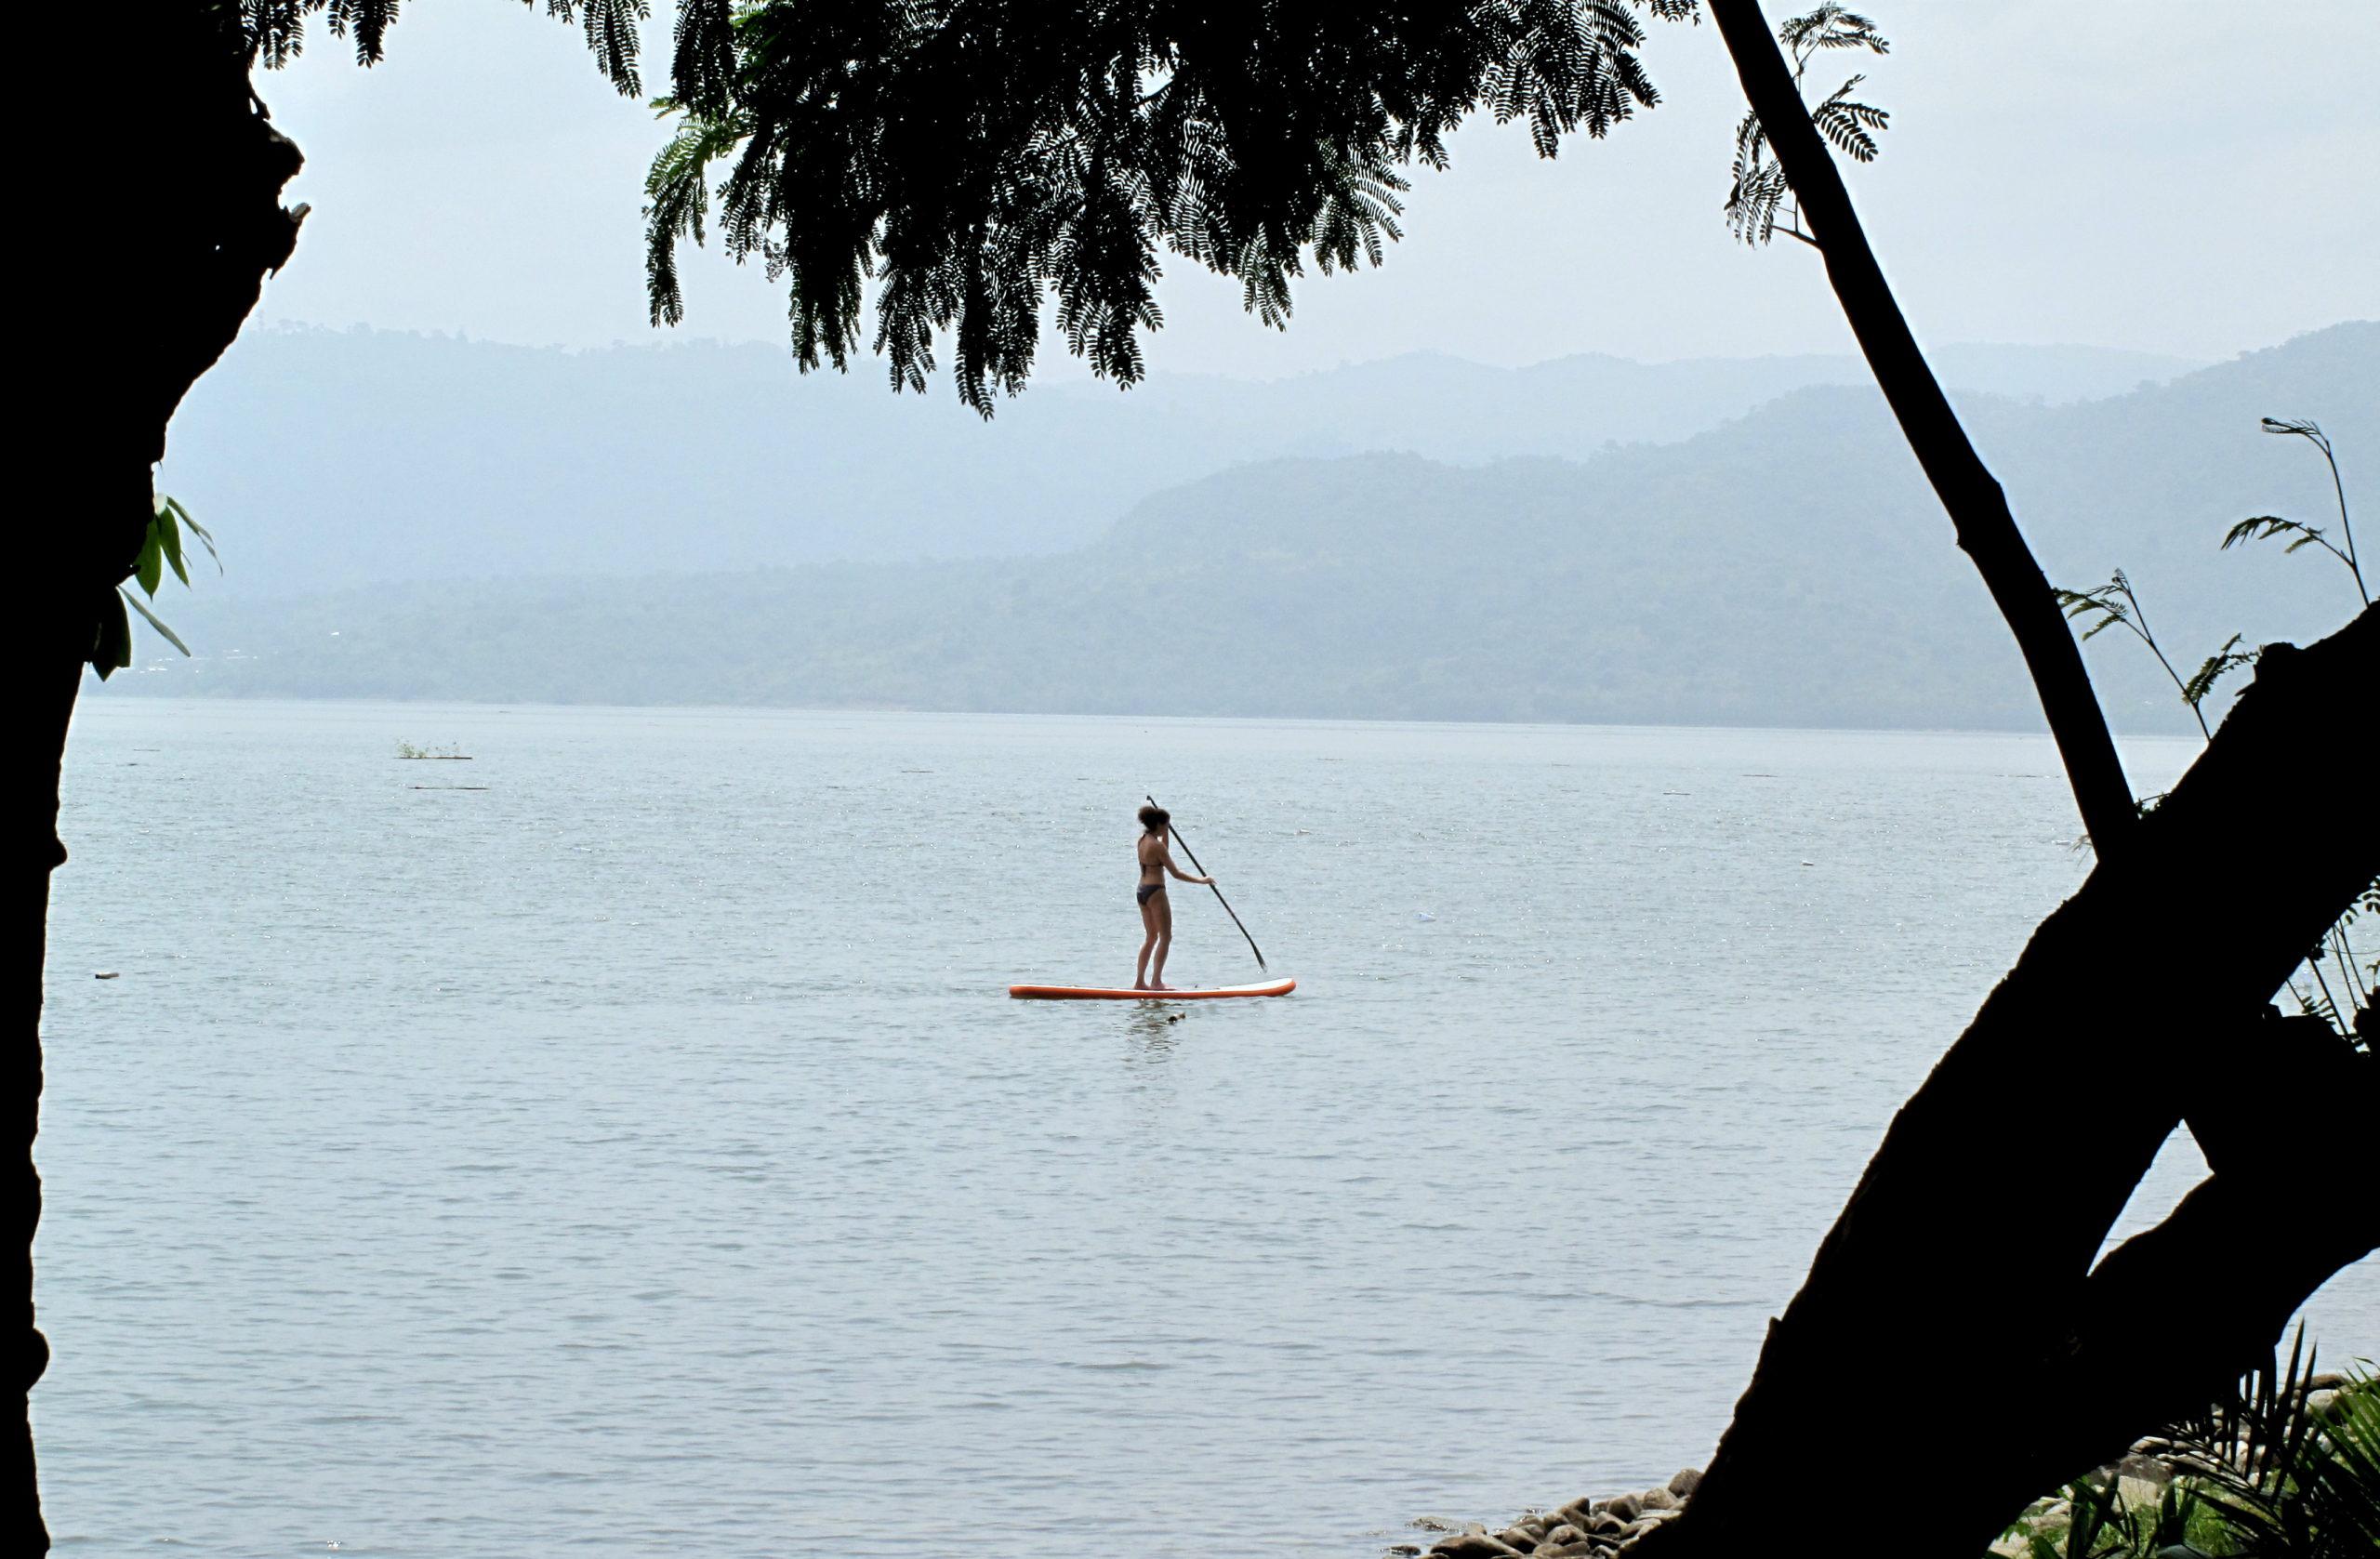 Stand up paddling (SUP) on Lake Bosumtwi